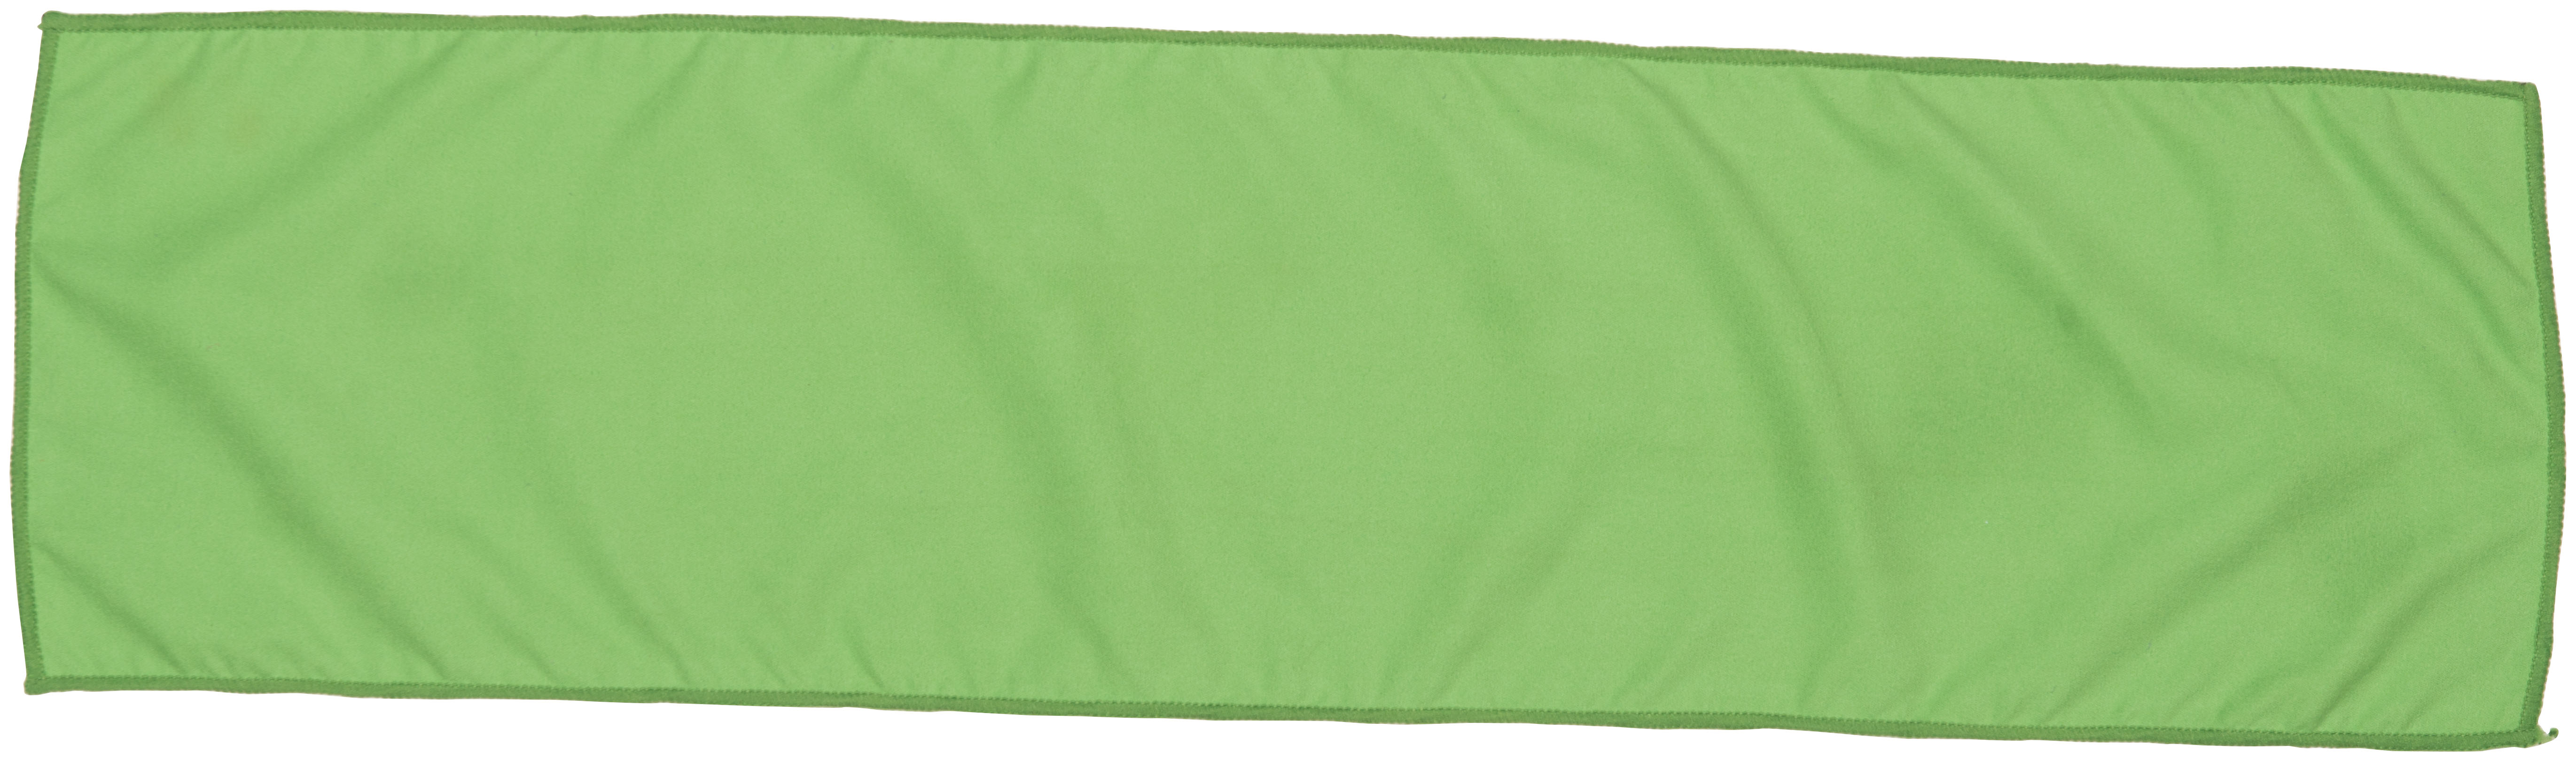 Frigitowel-Green-Small-Flat